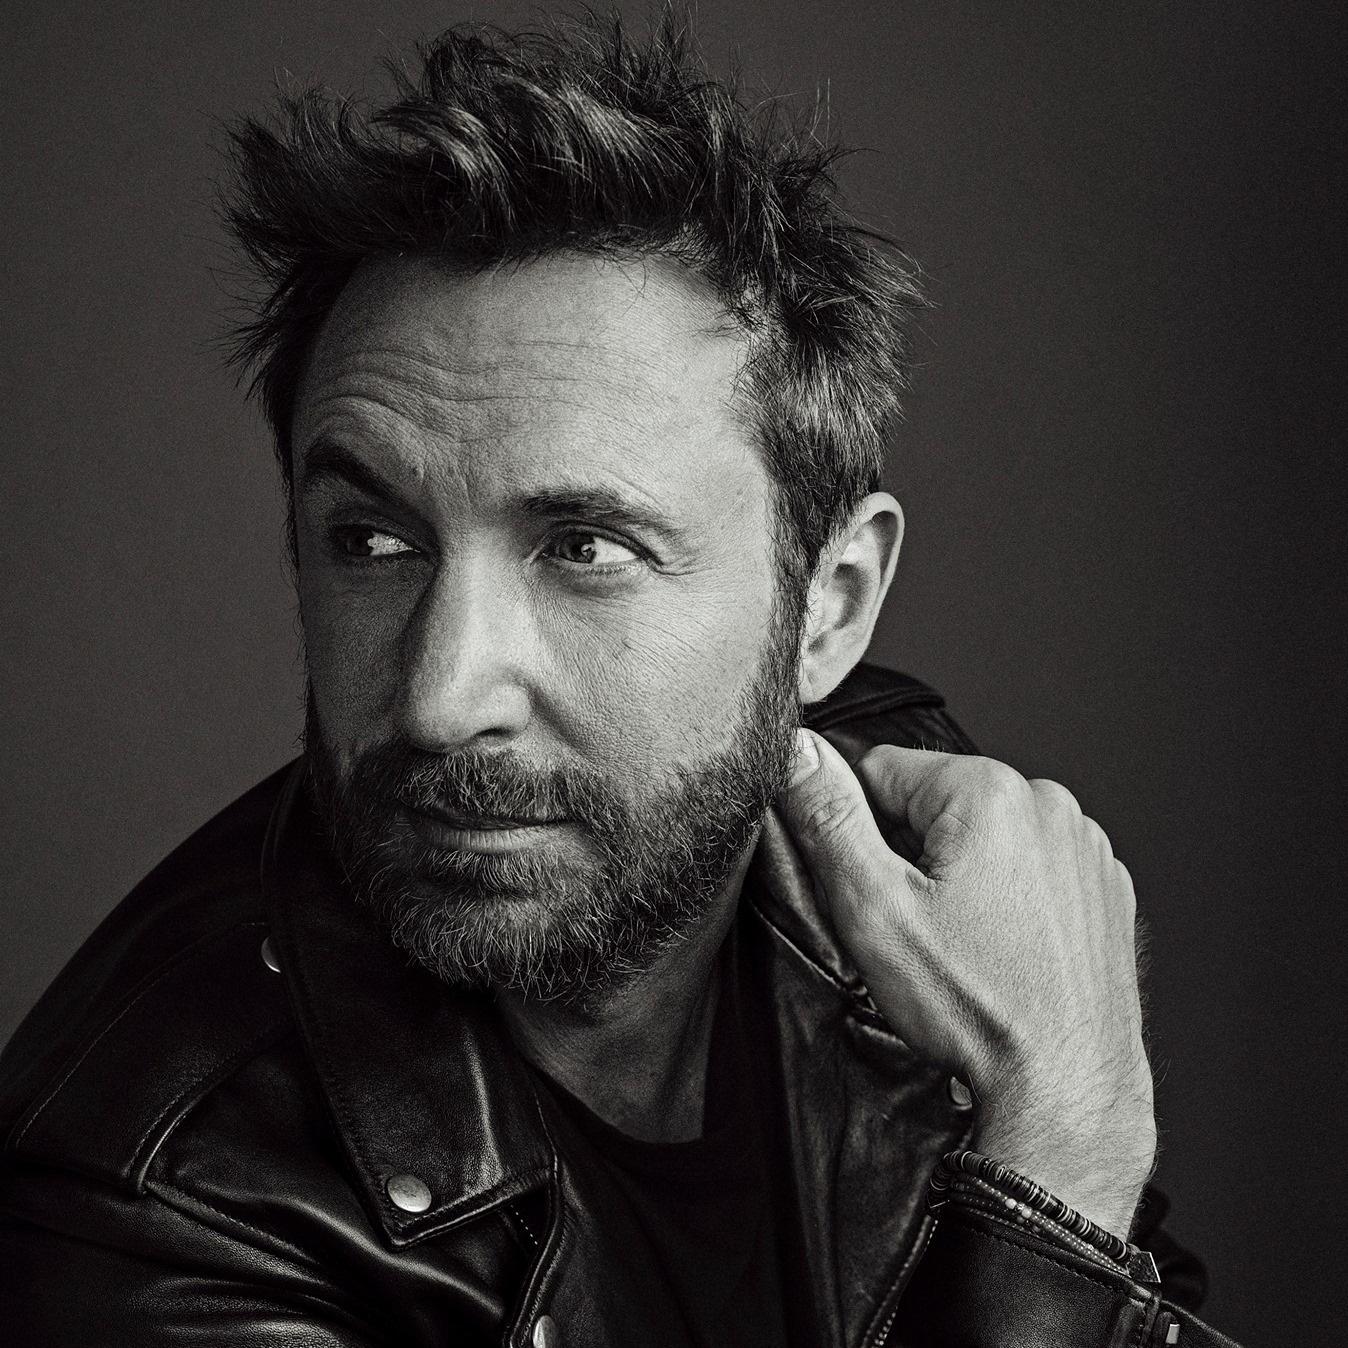 David Guetta · DJ, producer · DJ David Guetta